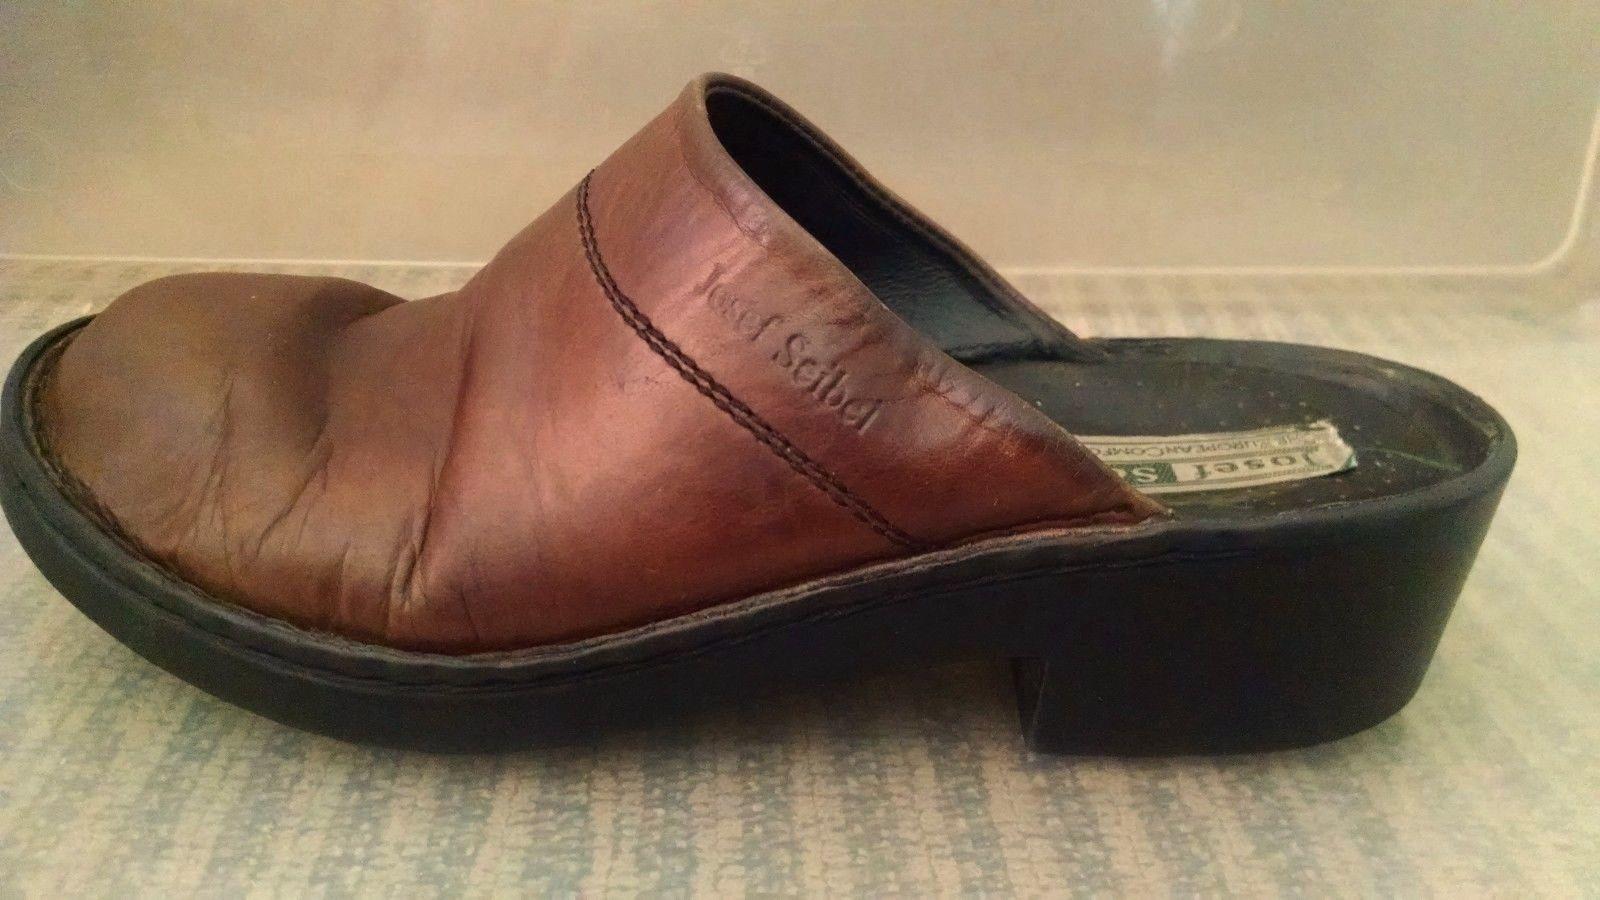 Josef Seibel Womens Clogs 38 EU 7 - 7.5 US Mules Slip On European Comfort Shoe image 4